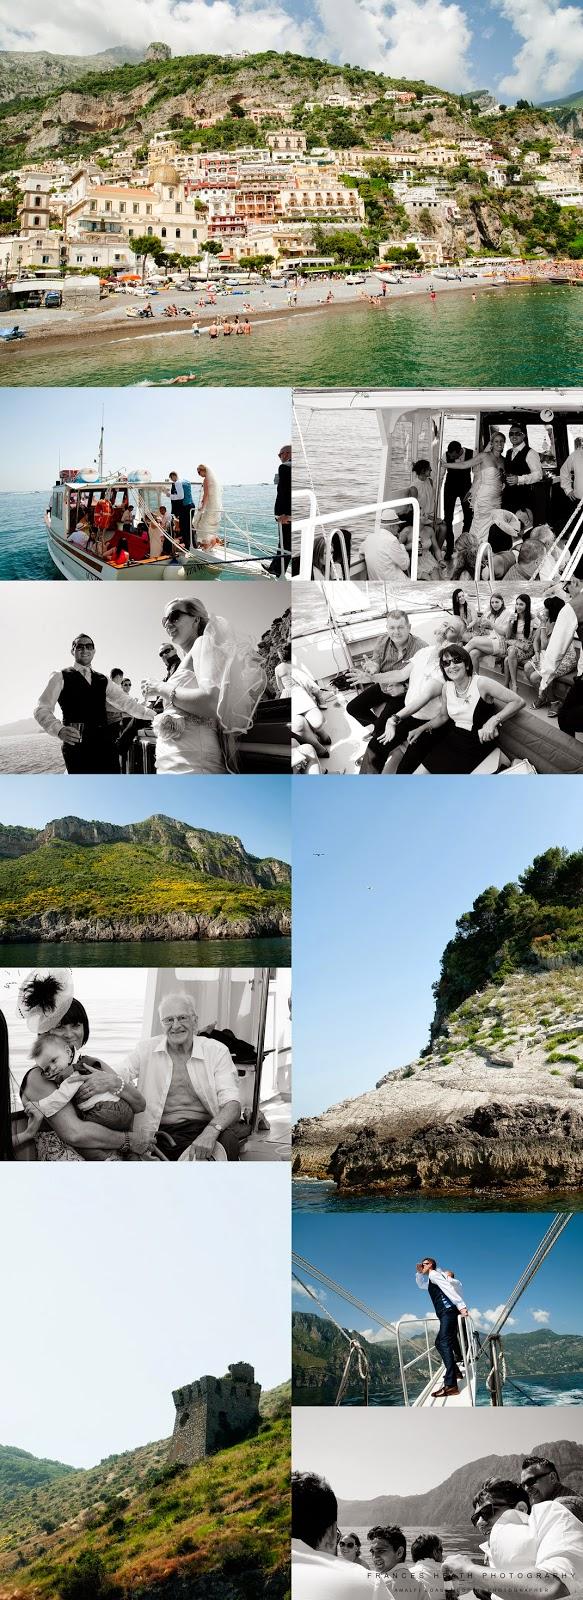 Wedding boat tour from Positano to Nerano